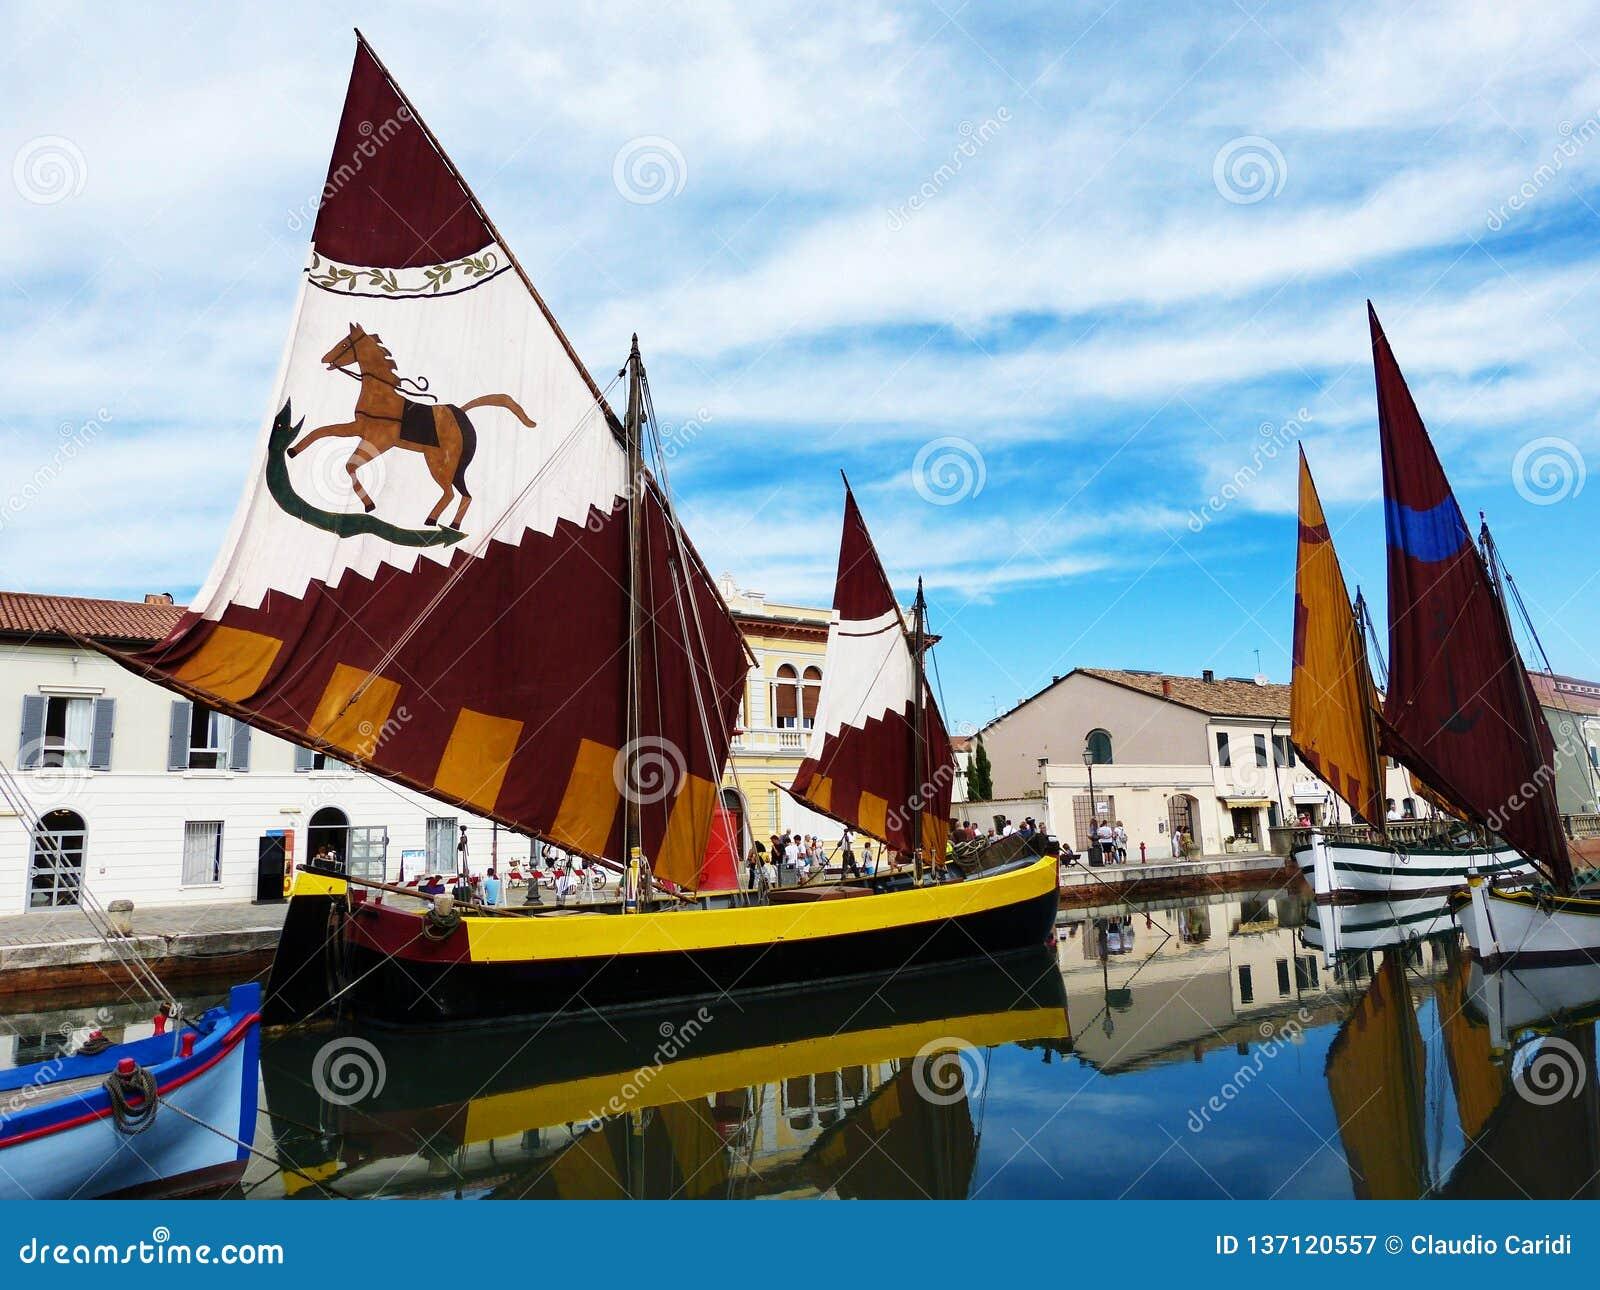 Harbor channel Leonardesque, traditional sailboats, Cesenatico, Italy